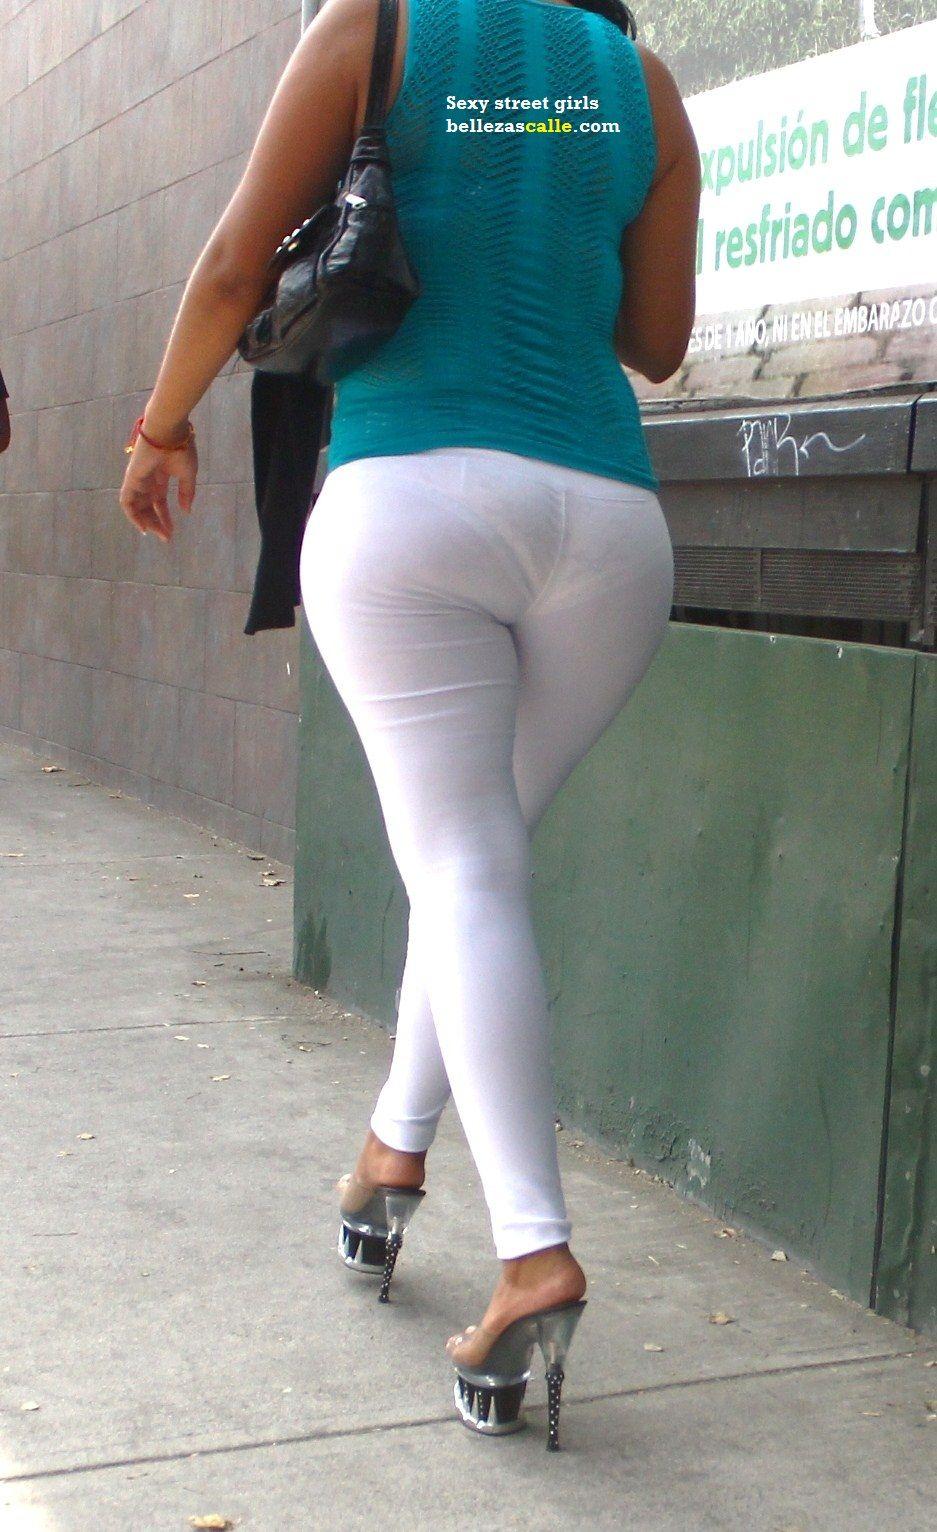 Culona con skirt gris - 2 part 9